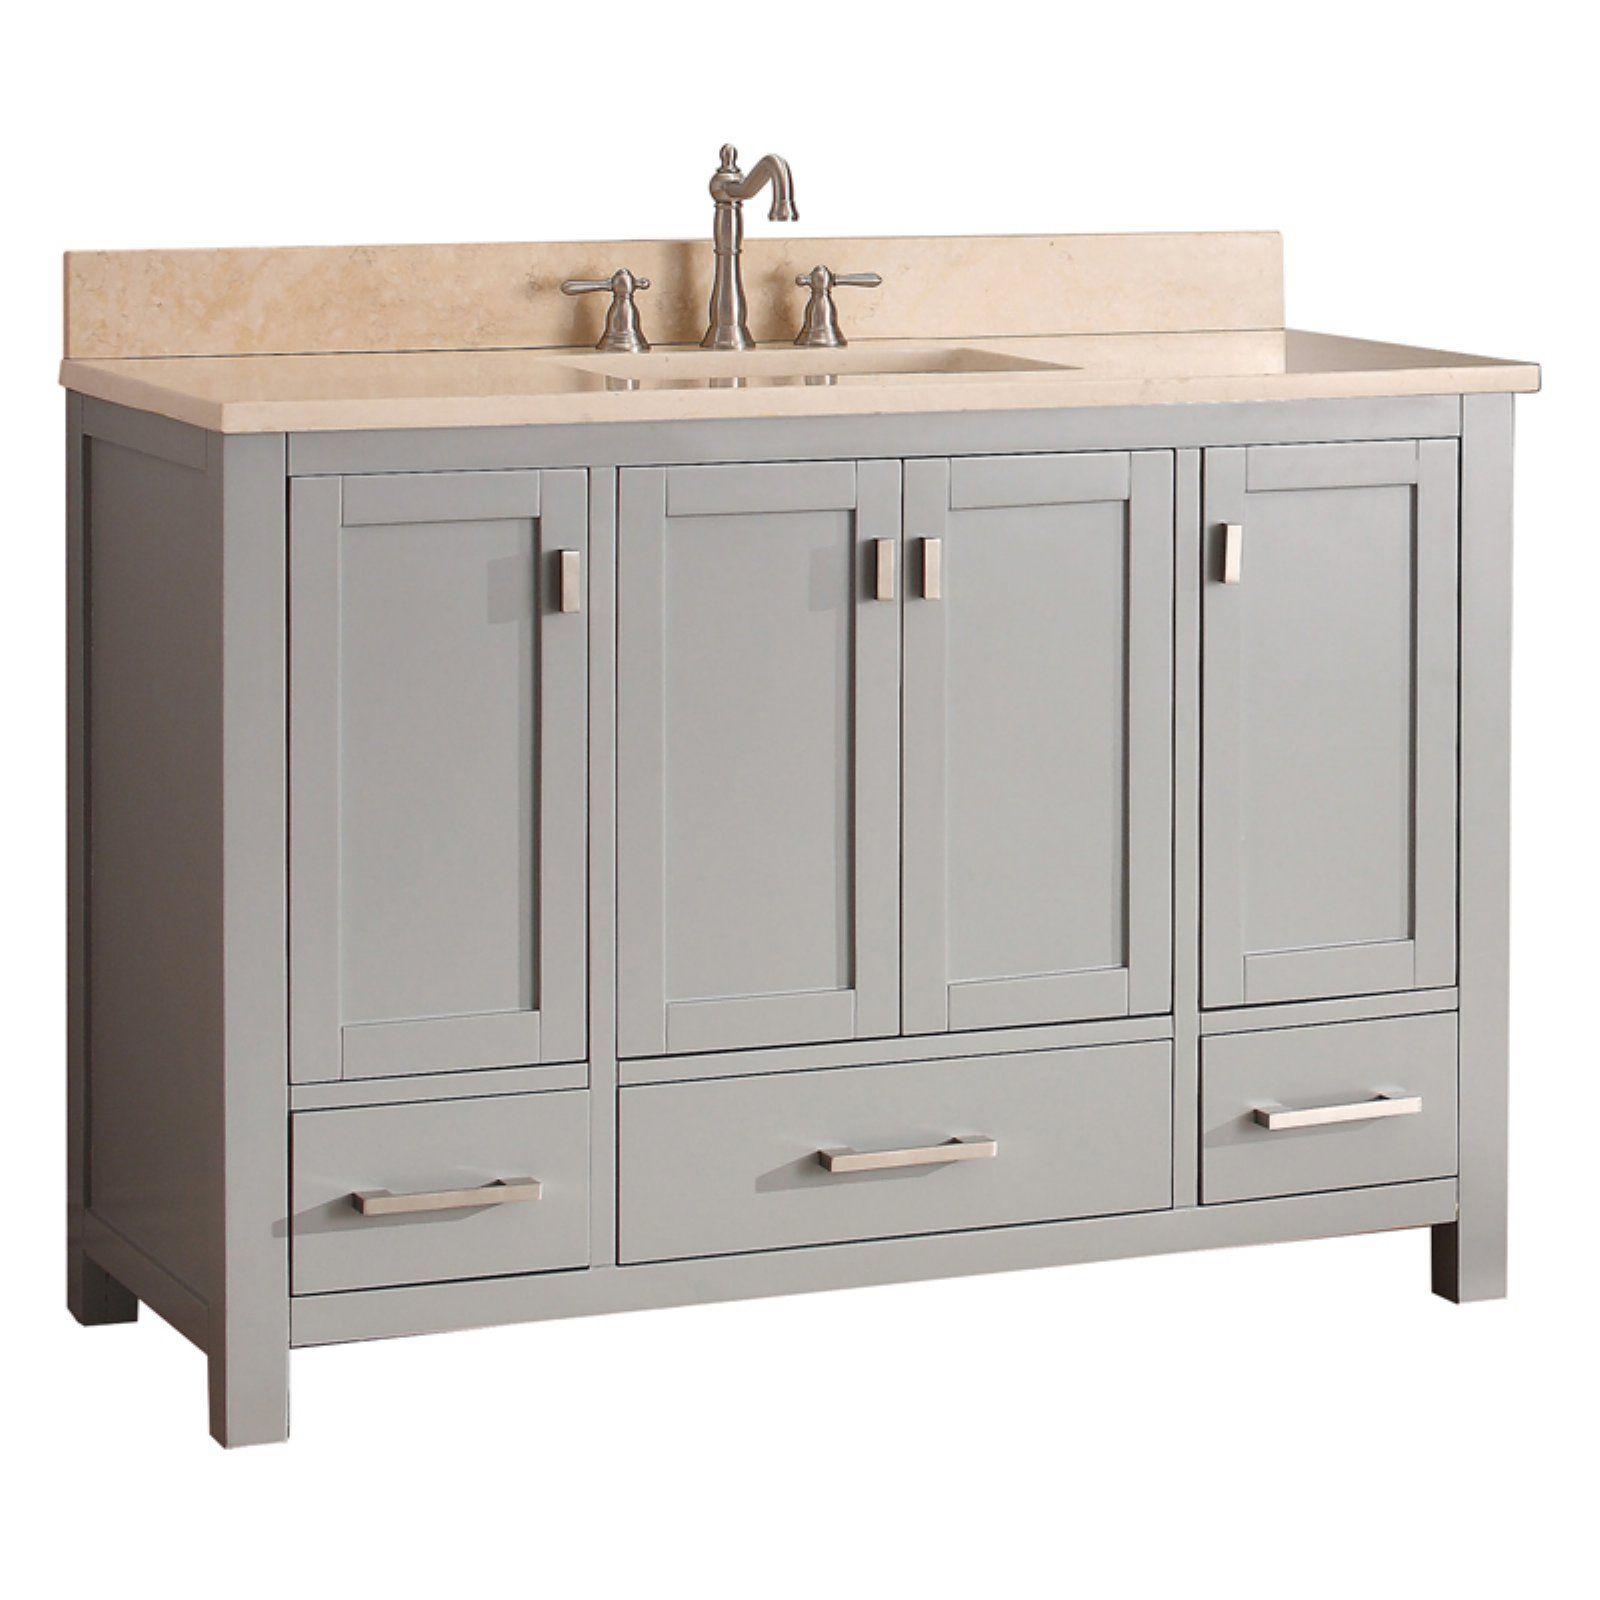 Avanity Modero Vs36 Cg Modero 48 In Single Bathroom Vanity